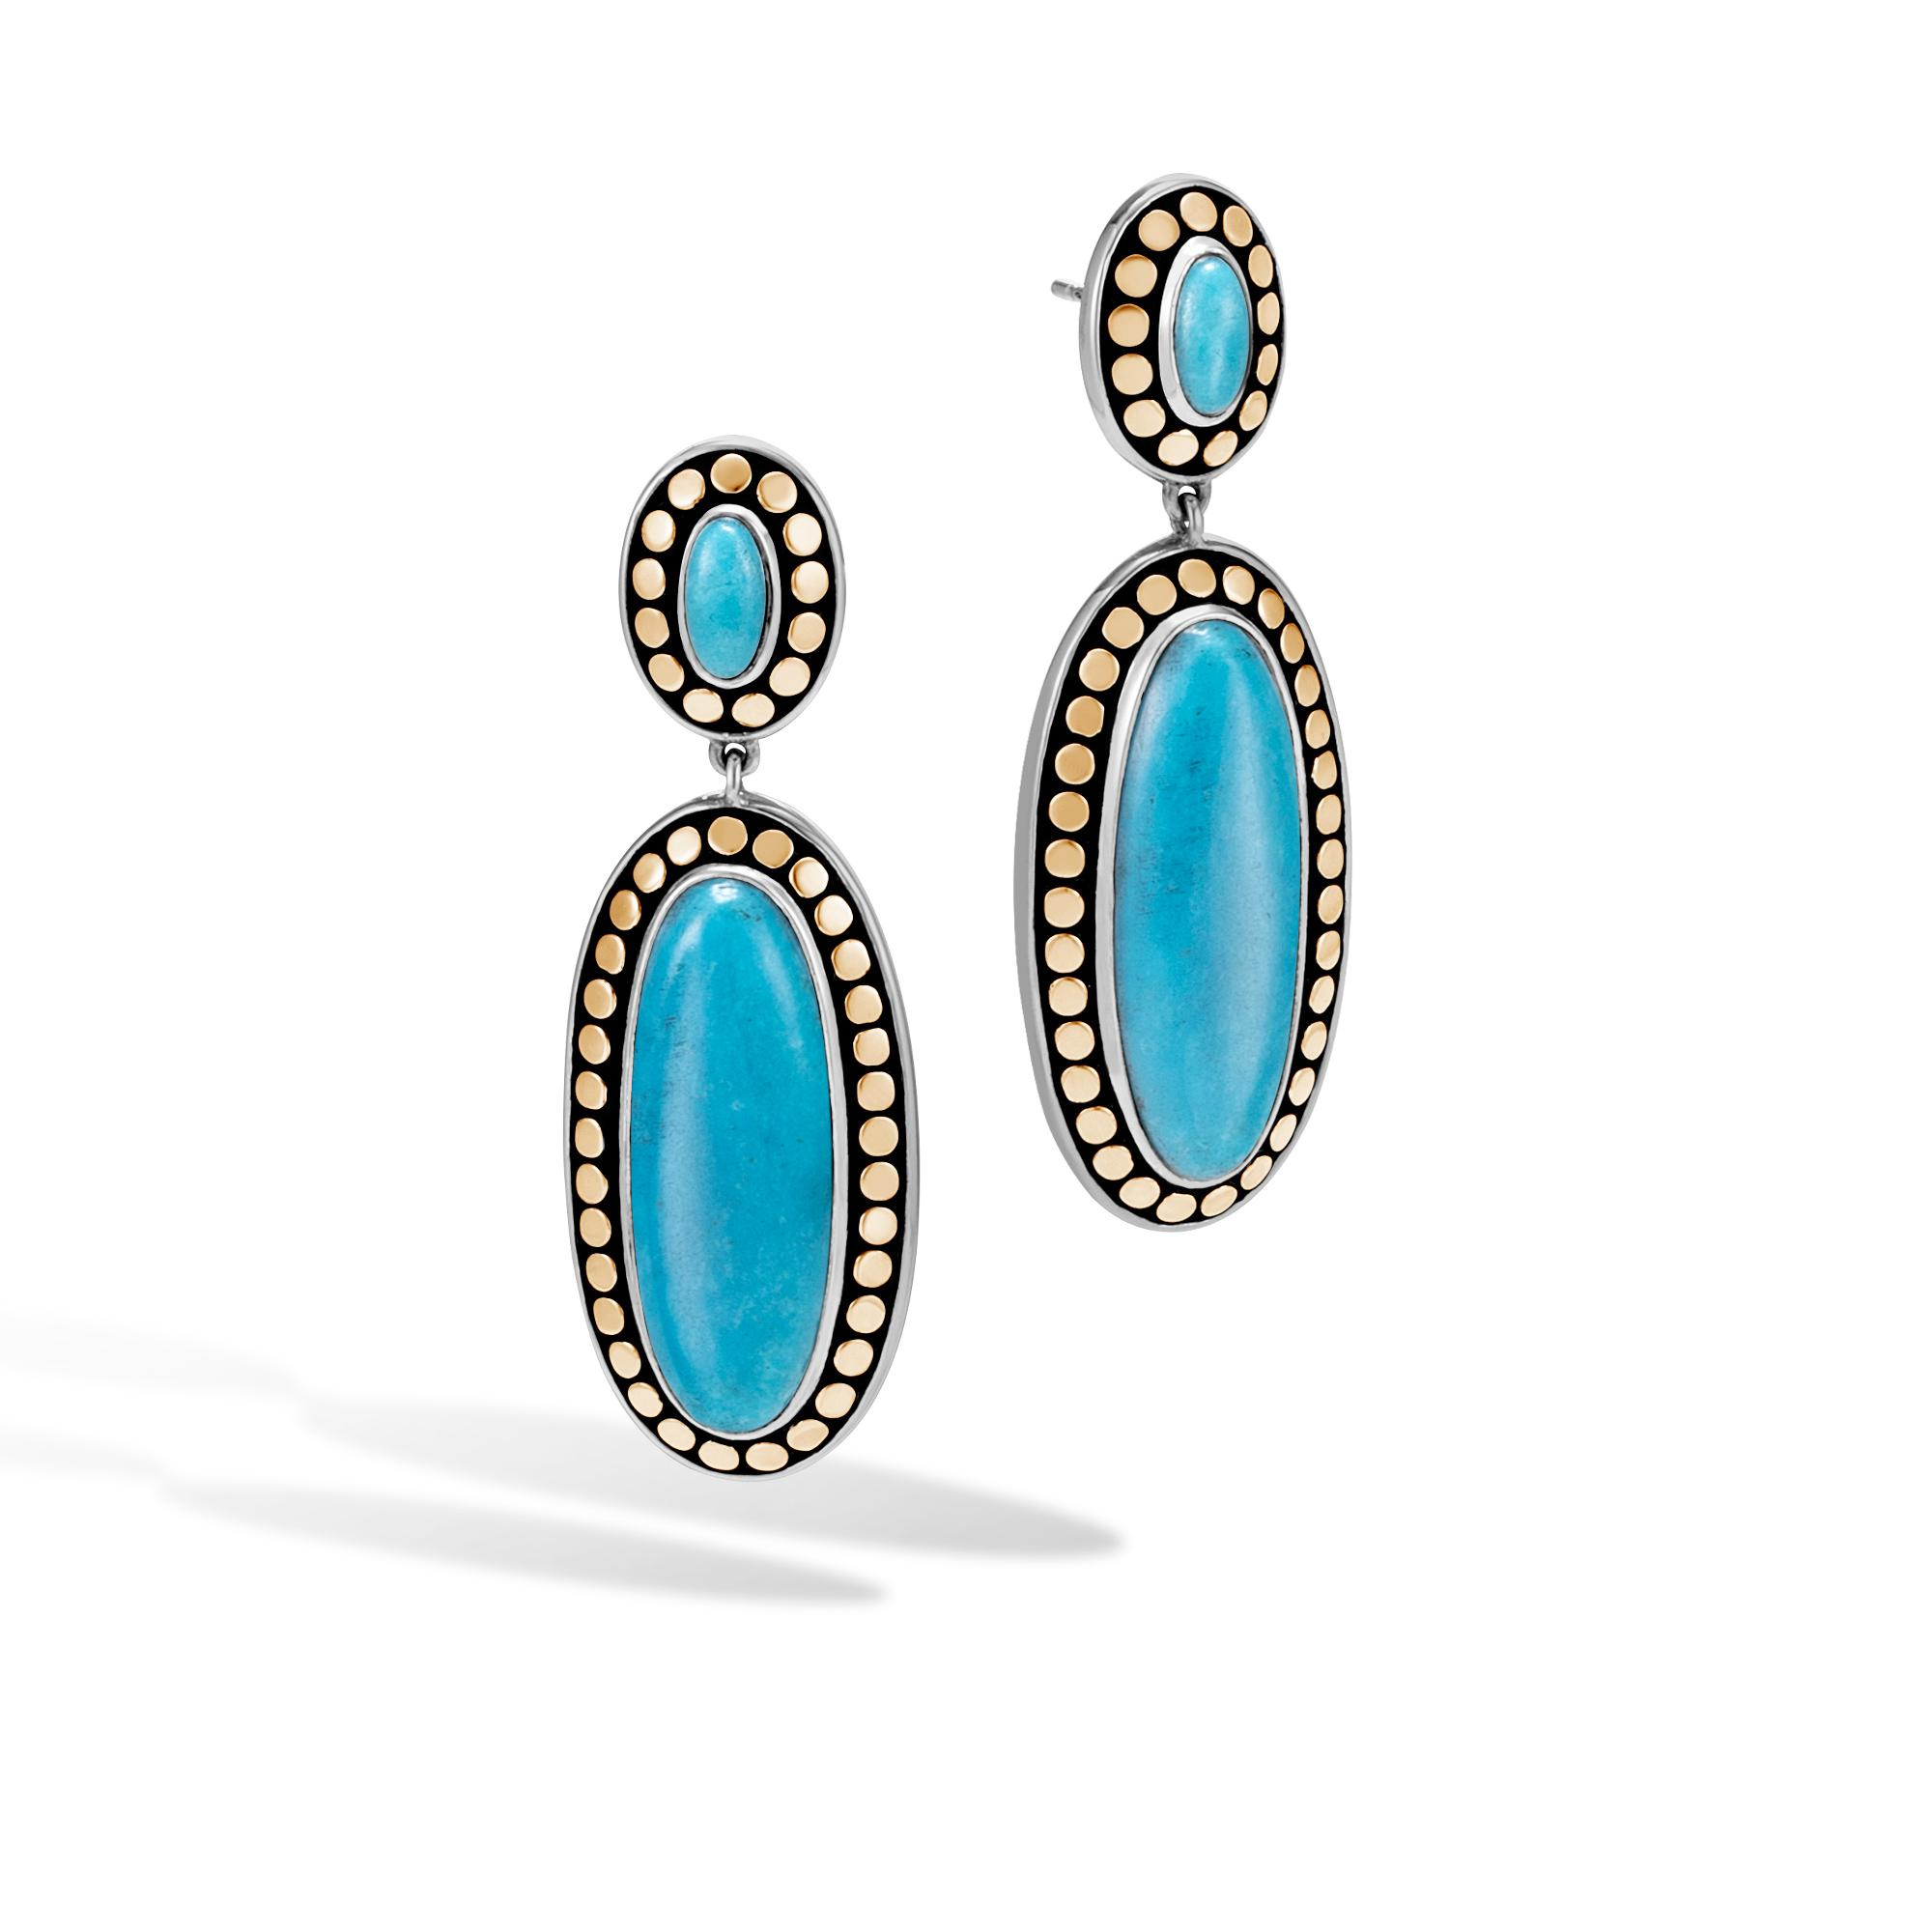 John Hardy Classic Chain Stud Earring With Turquoise Natural arizona turquoise XwcIw1lTy